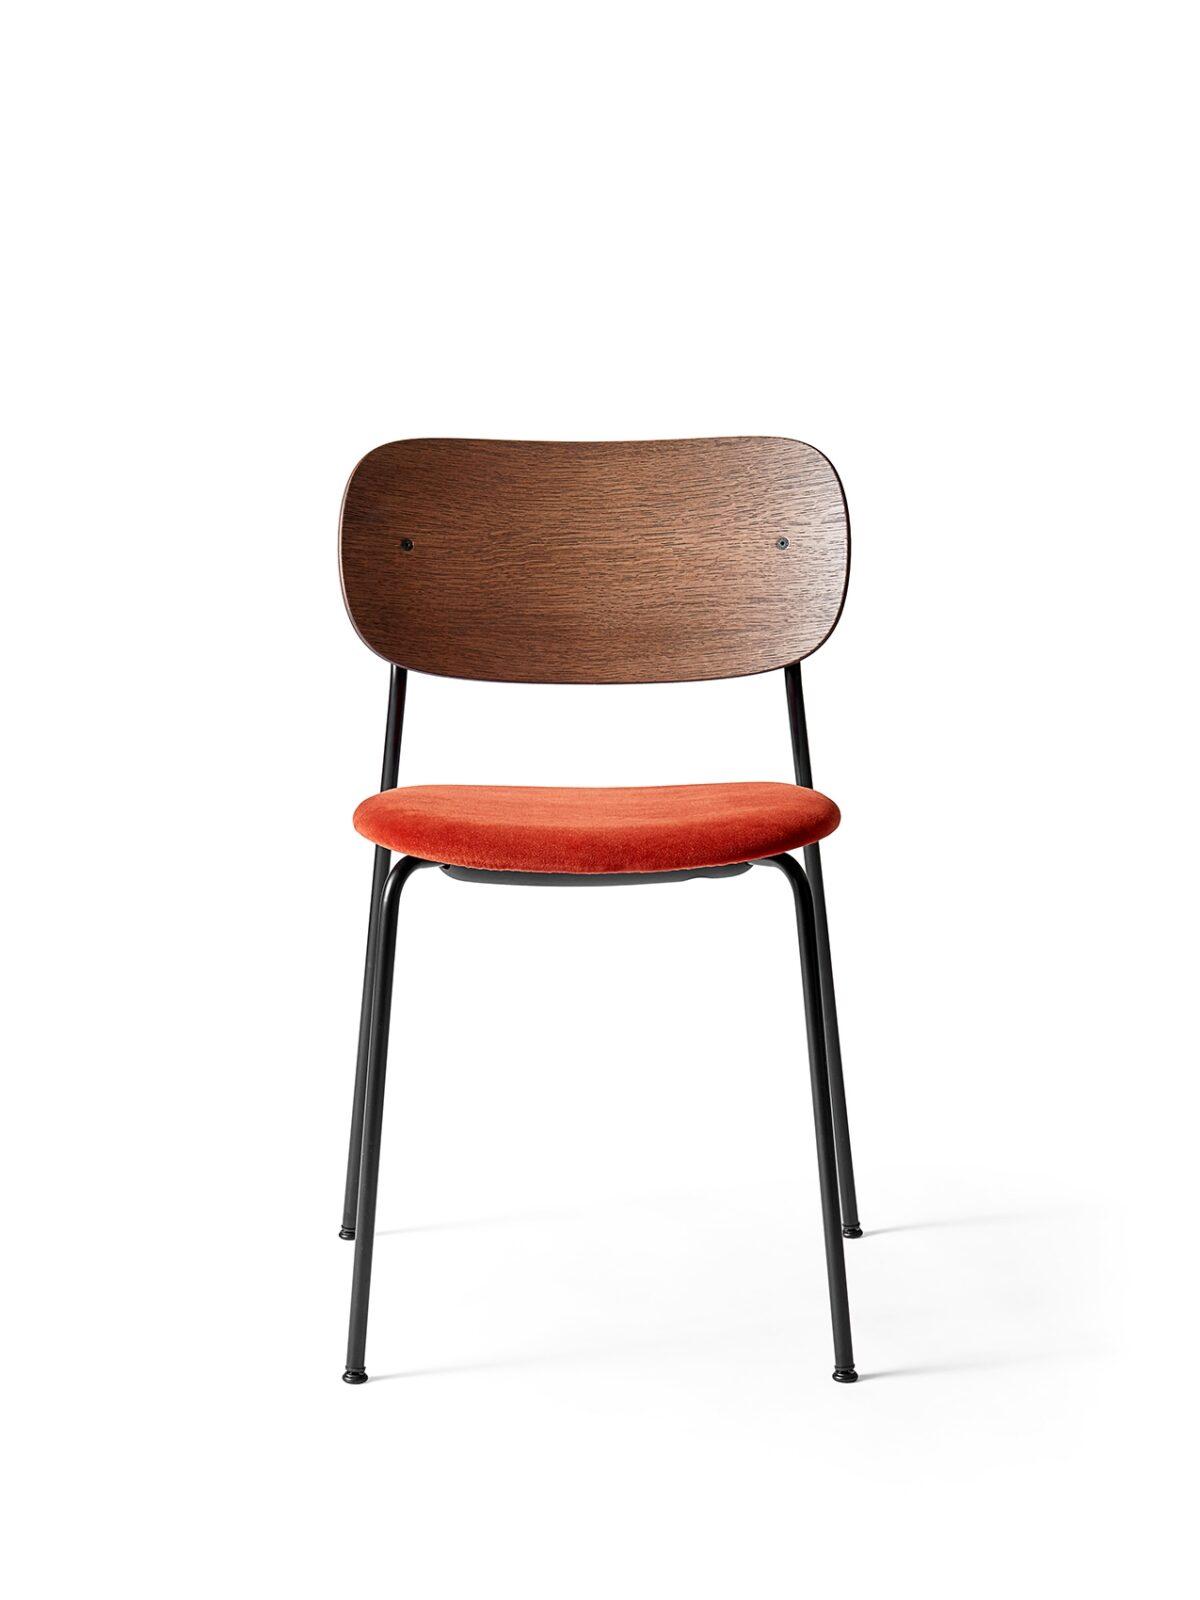 1166849 Co Dining Chair Dark Stained Oak City Velvet CA7832 062 front